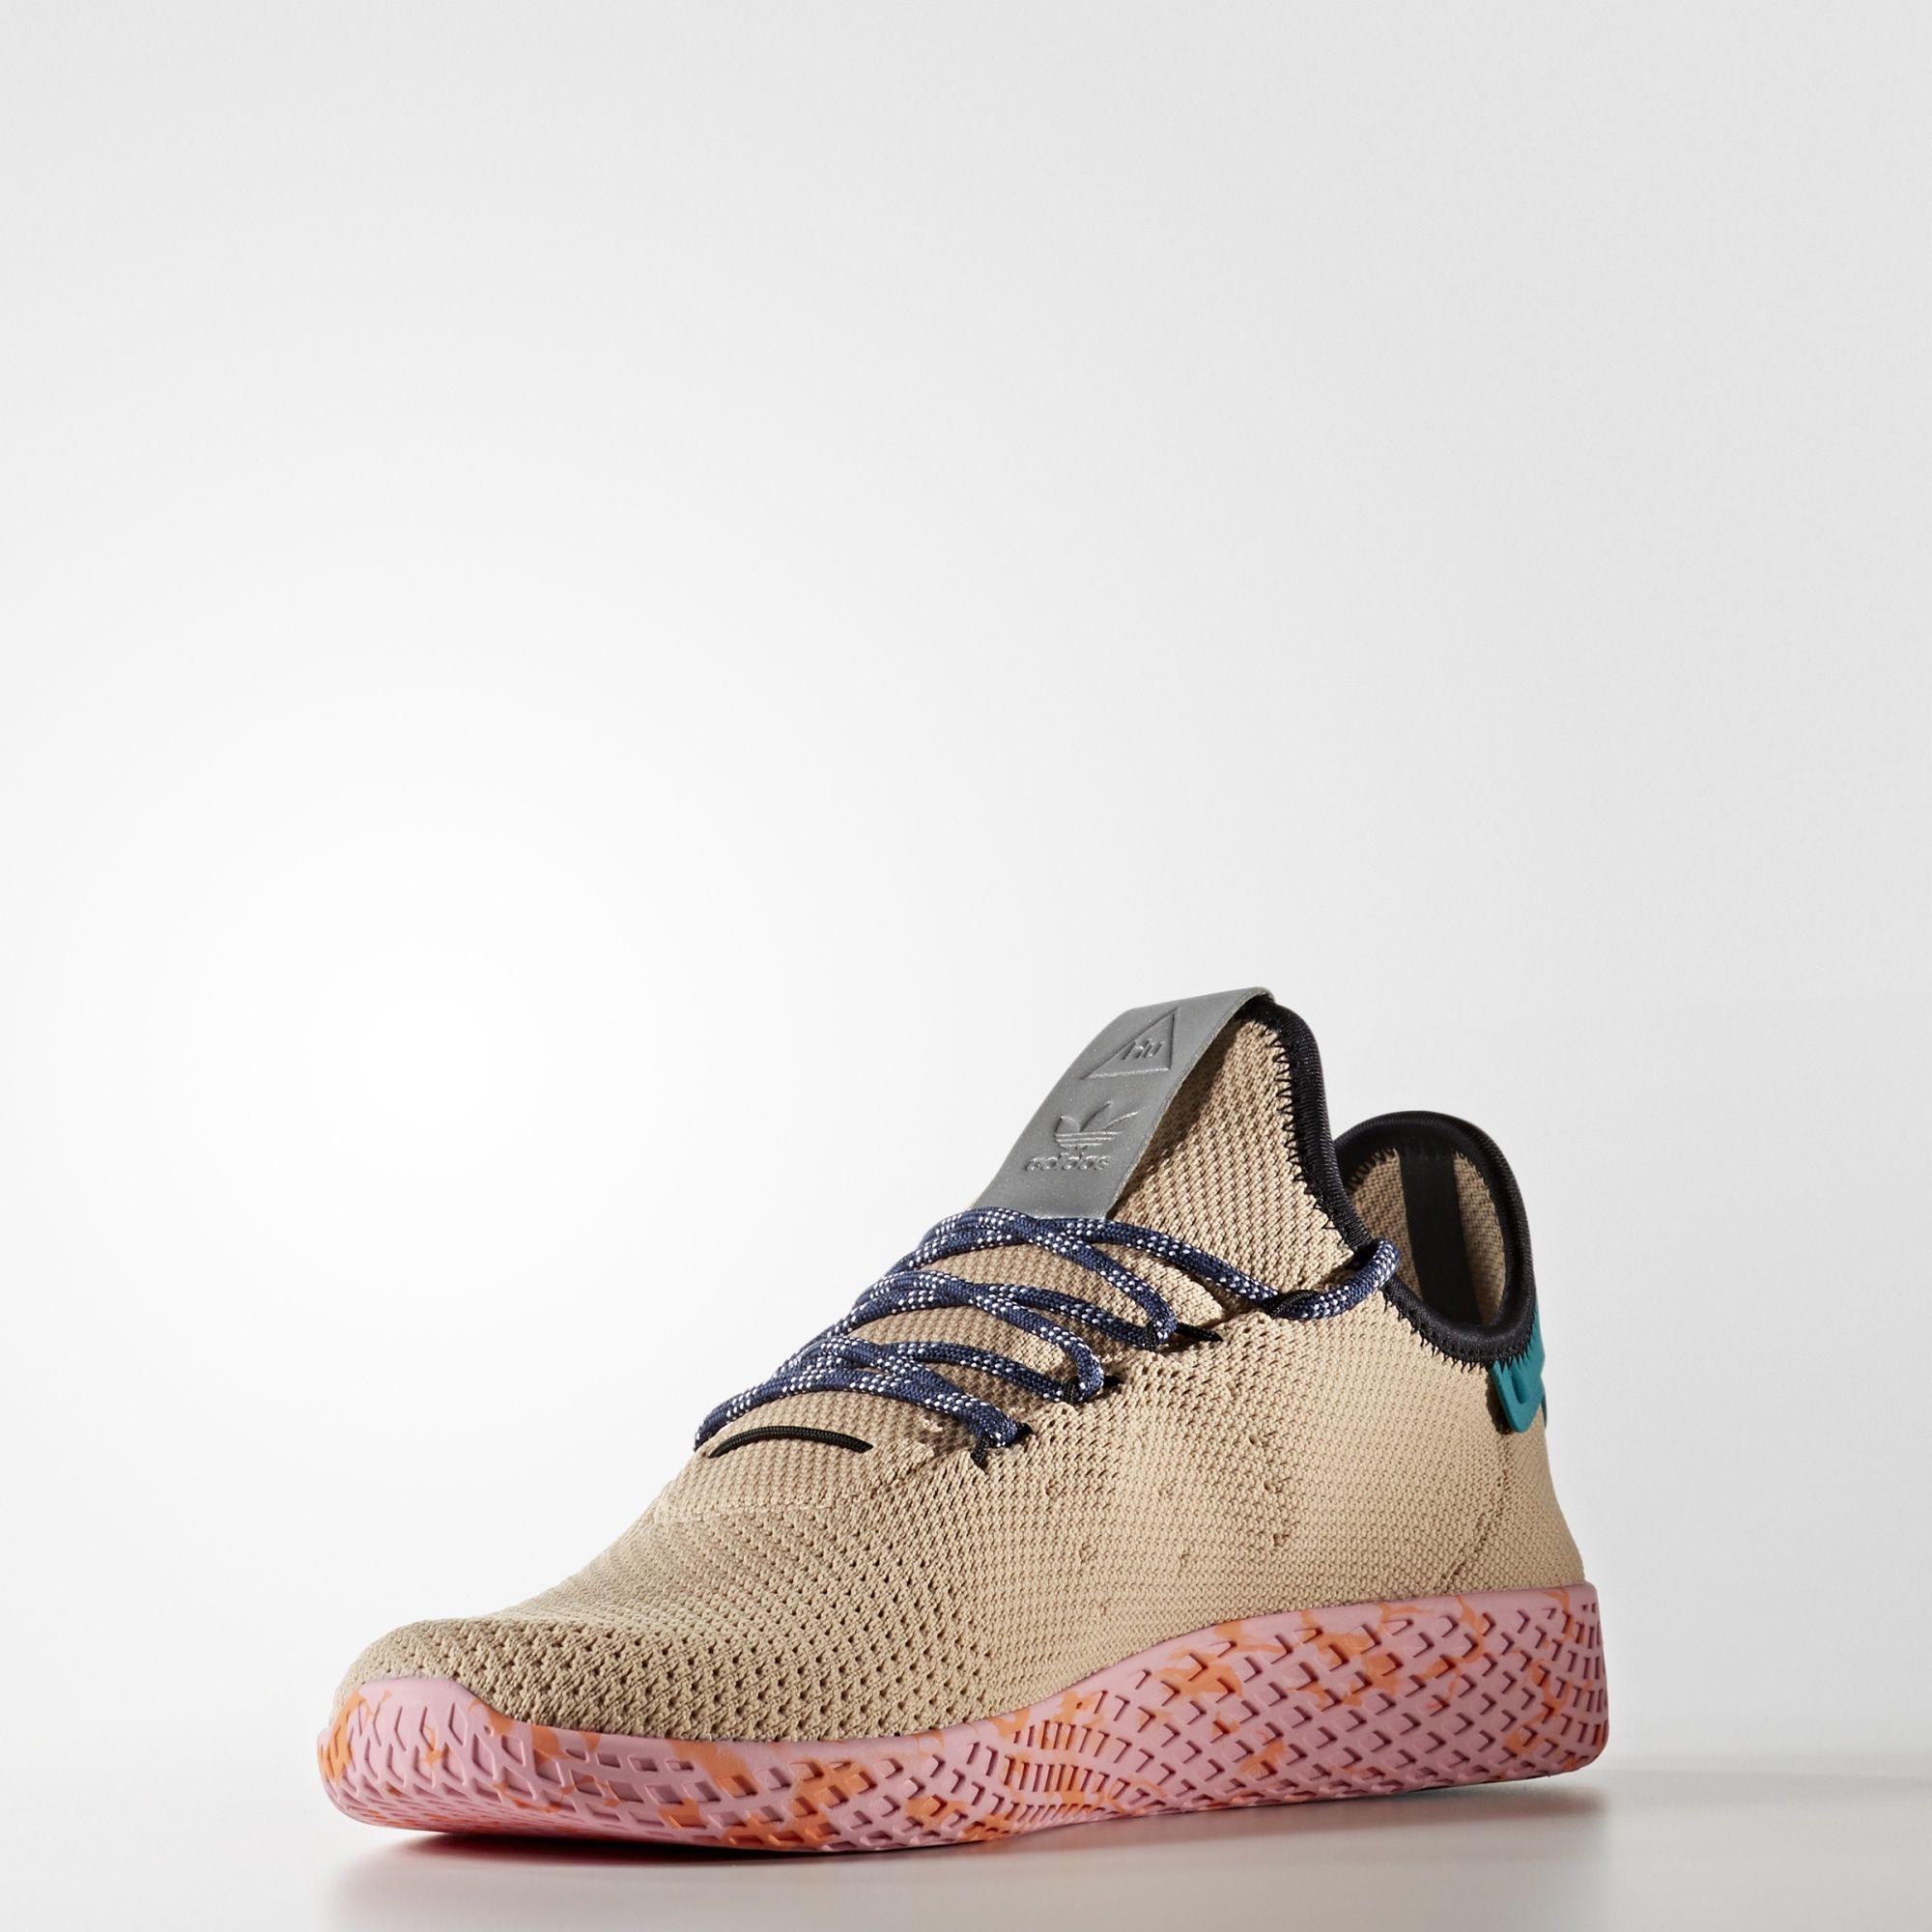 BY2672 Pharrell Williams x adidas Tennis HU Nomad Yellow 2